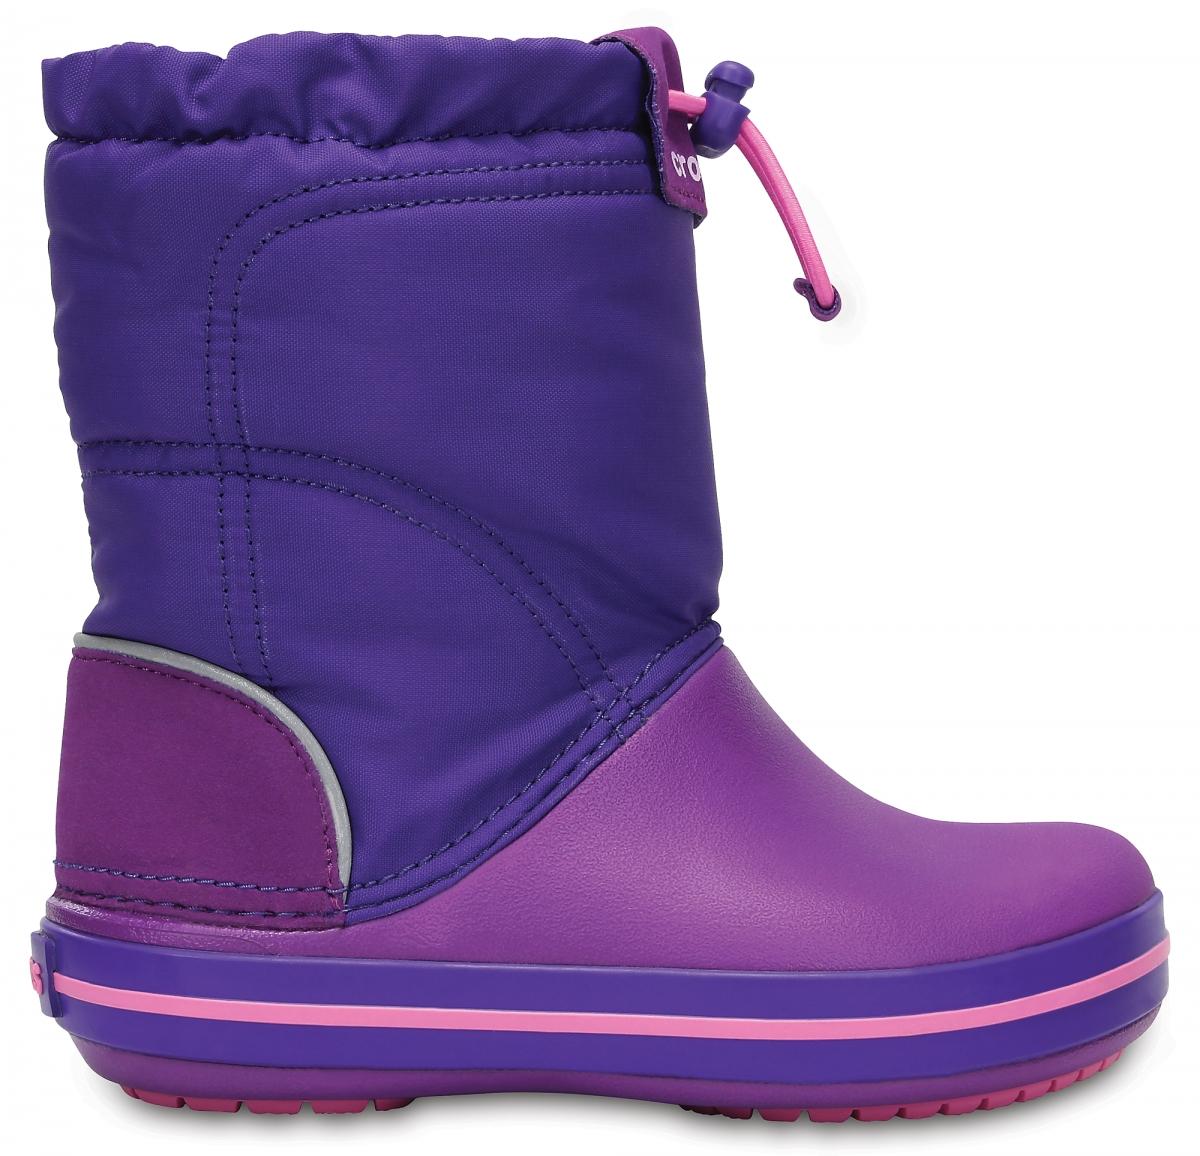 Crocs Crocband LodgePoint Boot Kids - Amethyst/Ultraviolet, C9 (25-26)